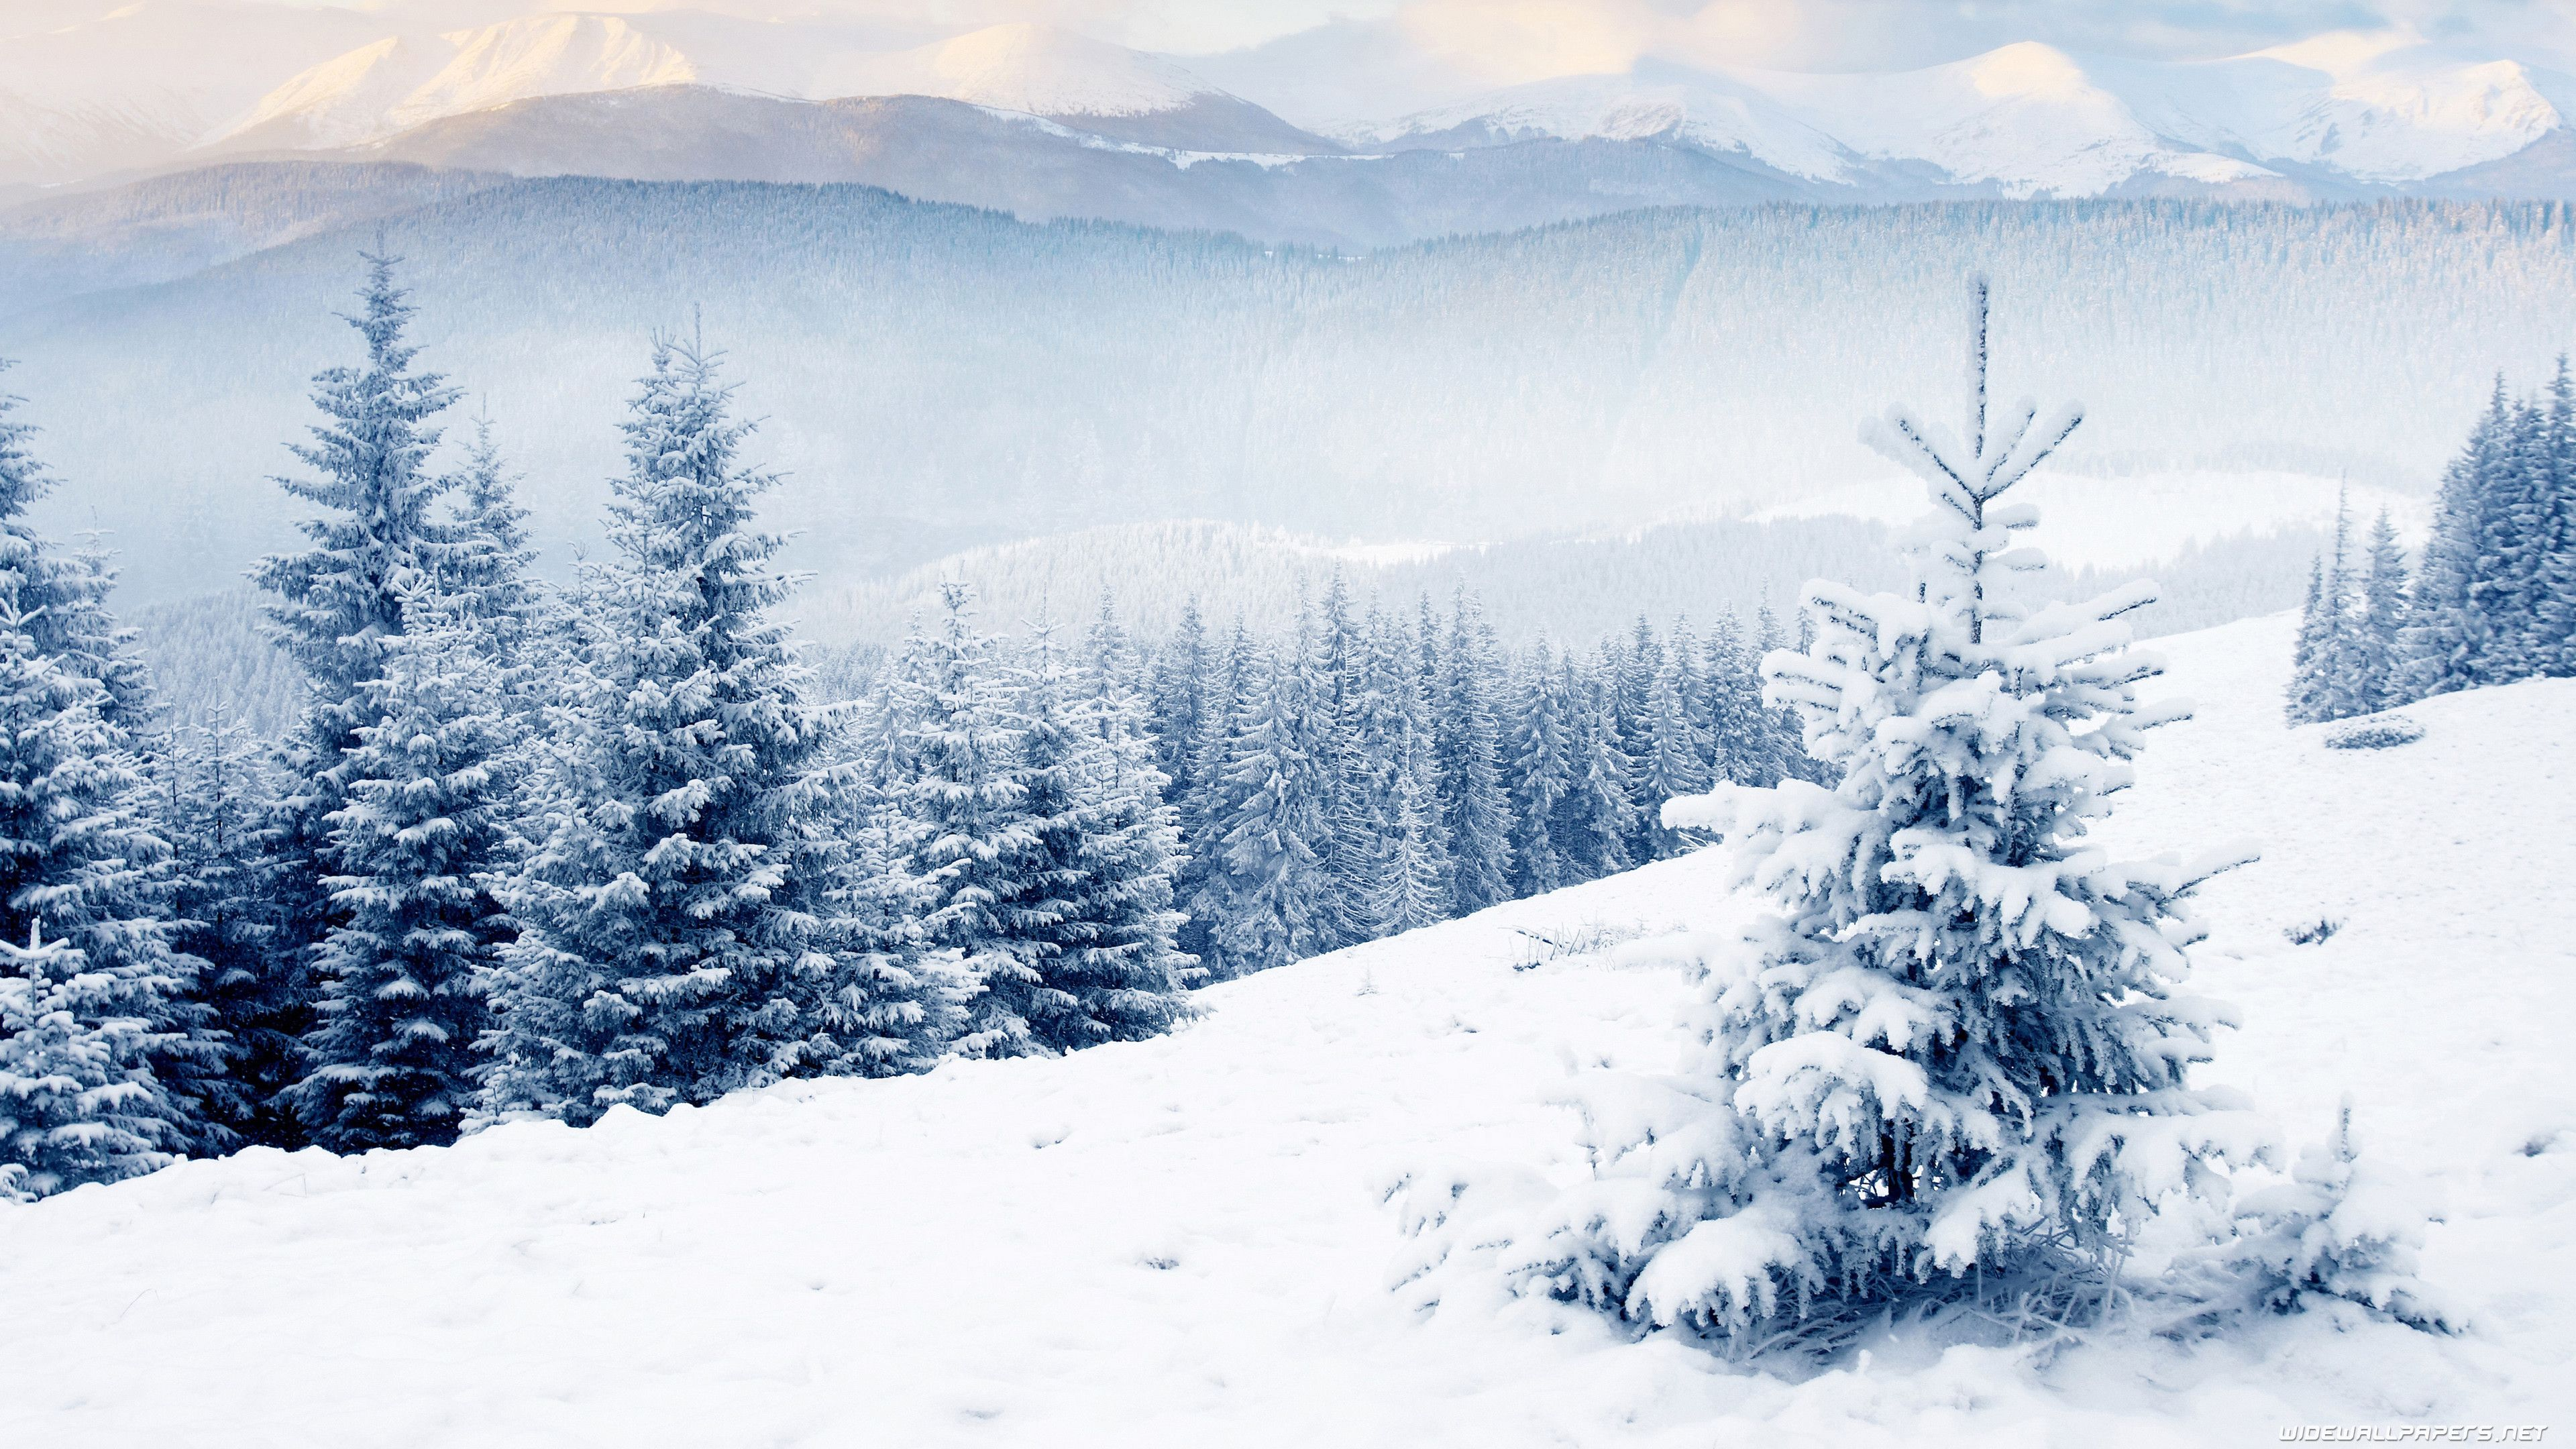 Res 3840x2160 Winter Scenery Winter Wallpaper Hd Winter Desktop Background